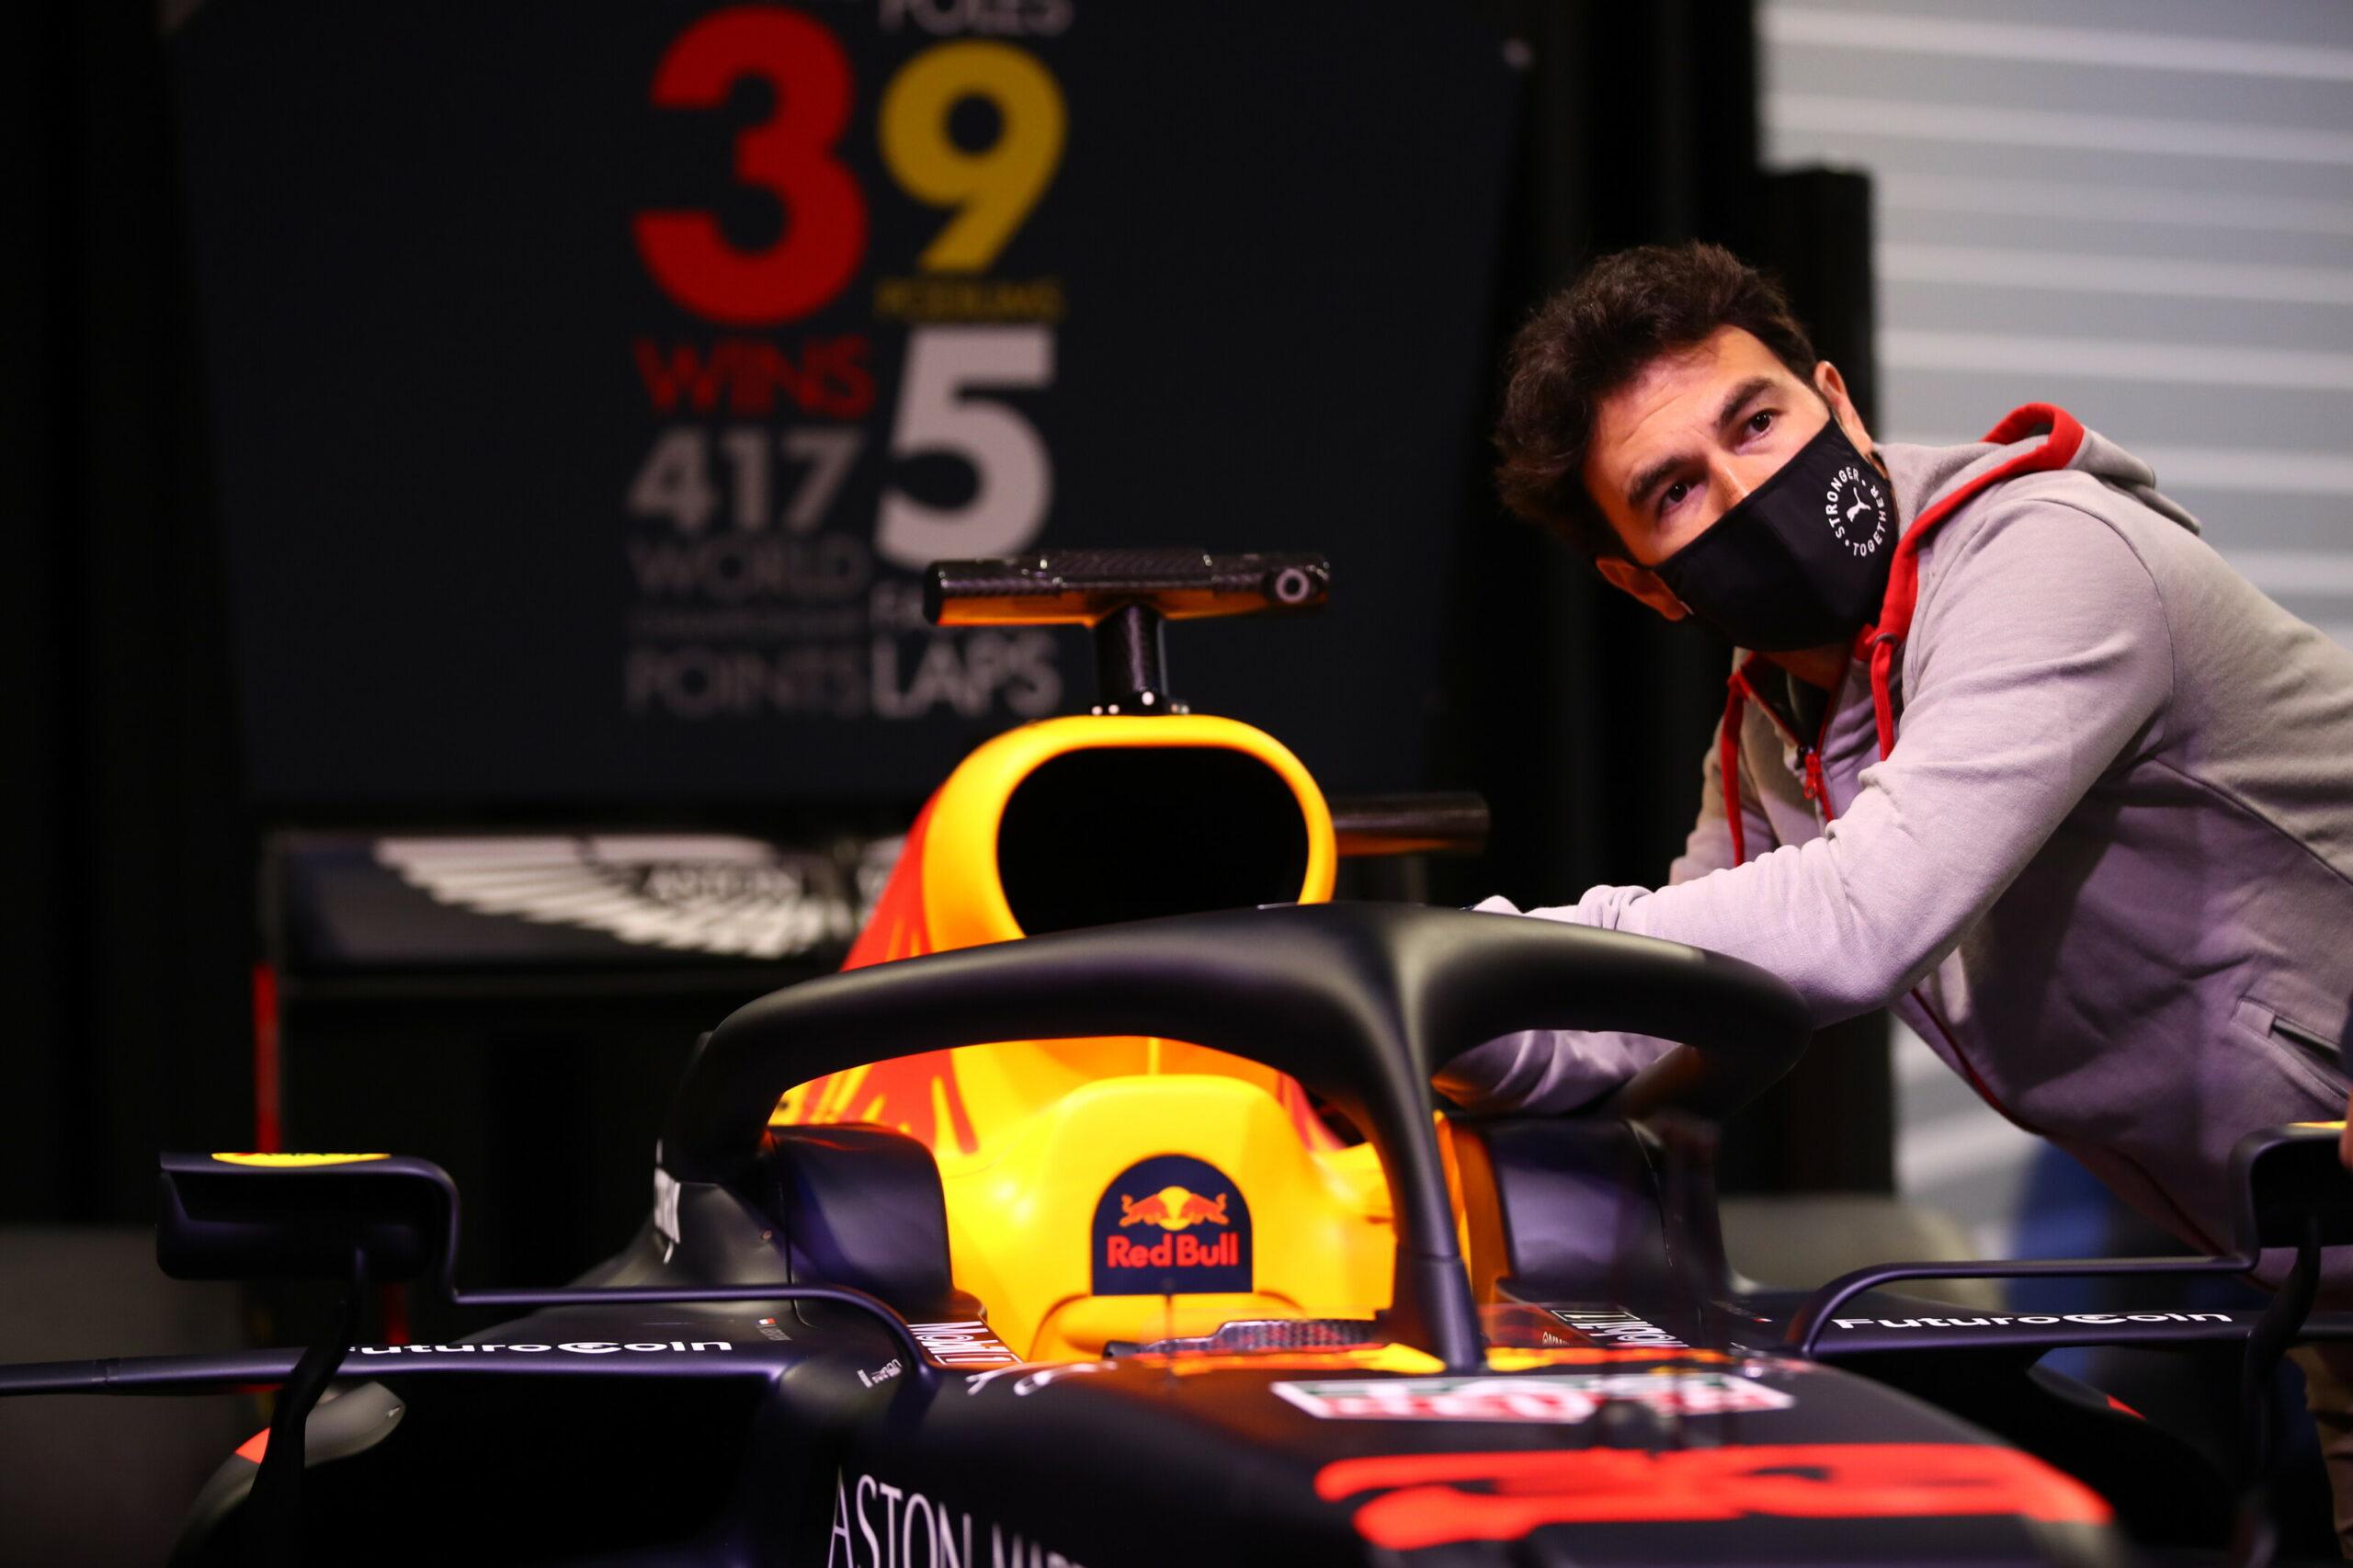 F1 - Red Bull Racing présente sa F1 2021 ce mardi